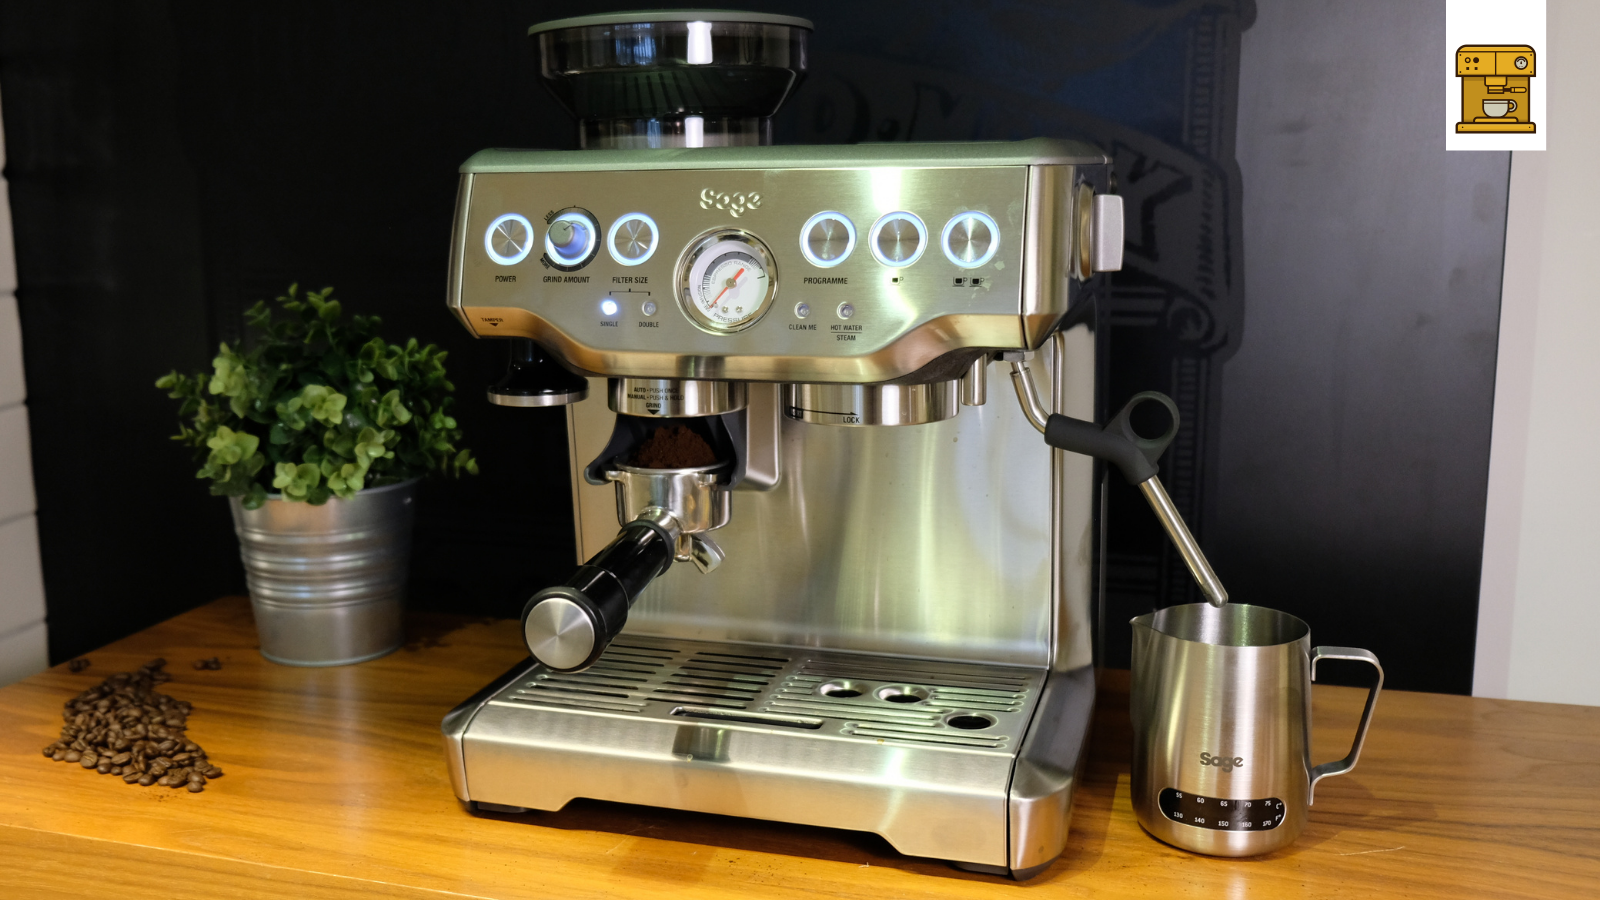 Sage espresso machine